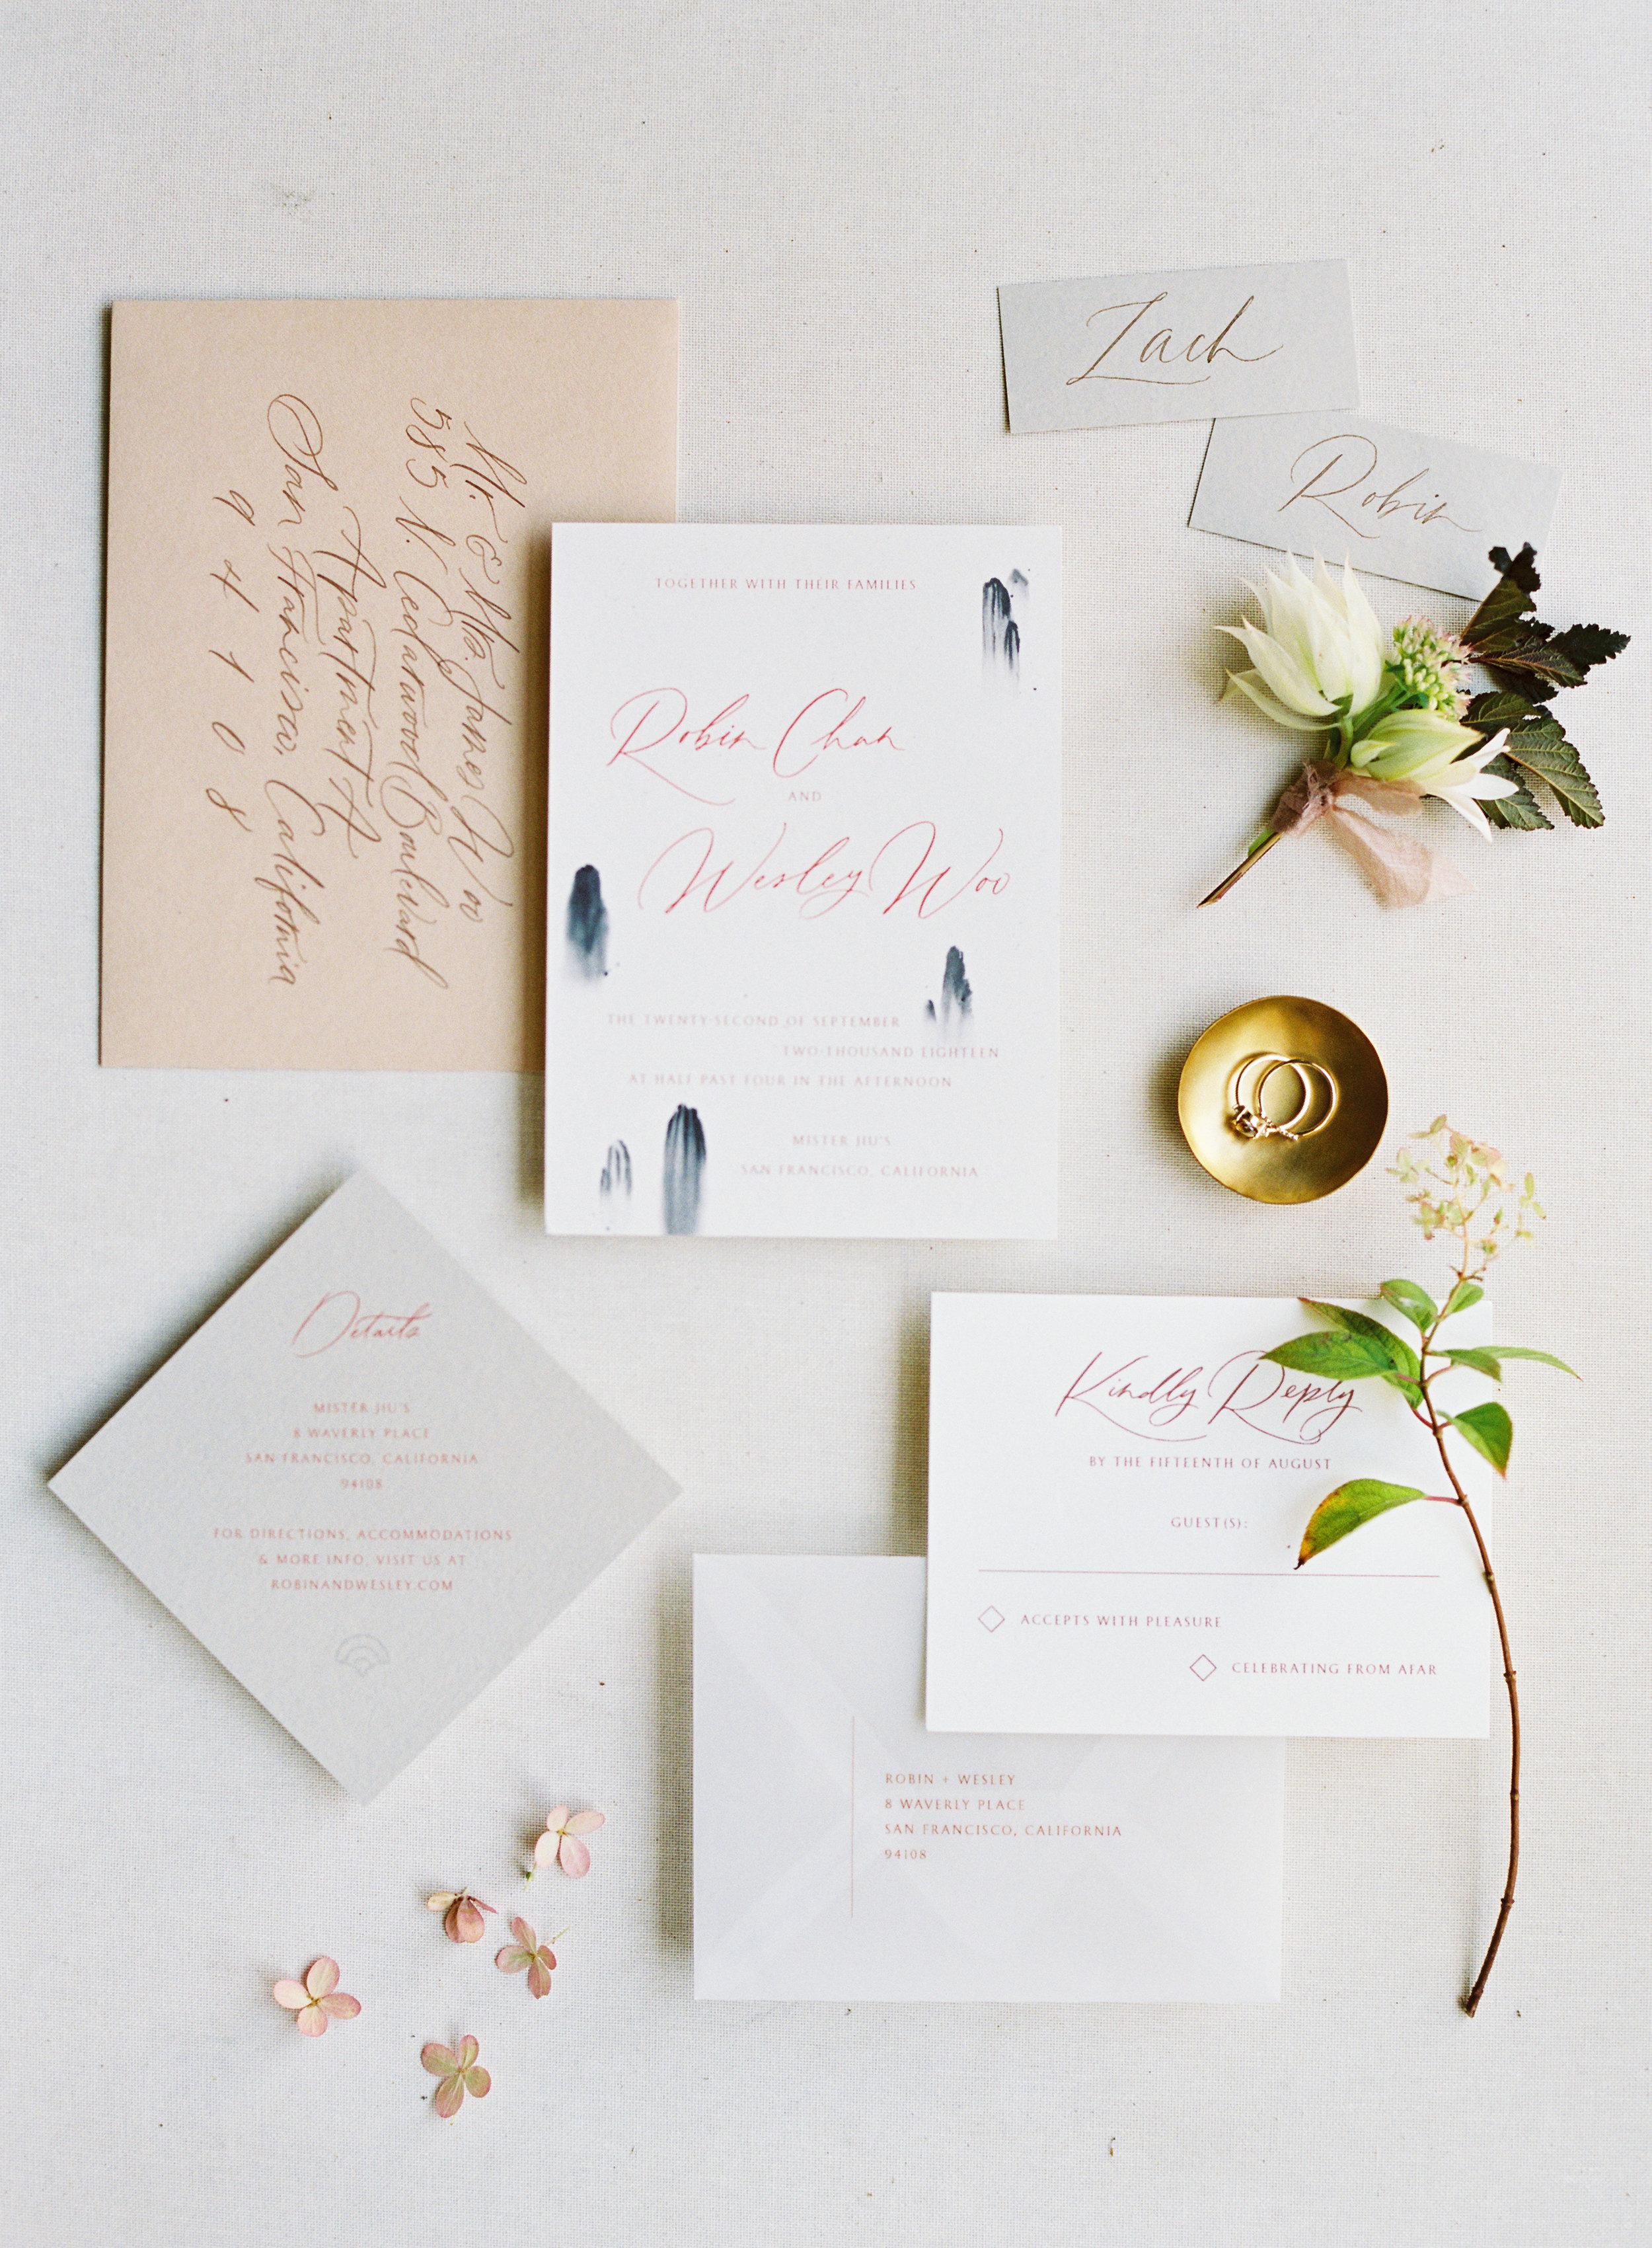 Jordan & Natalie - Lambert FloralMister Jiu'sSkyla ArtsOwl Post CalligraphyNatalie Choi Events